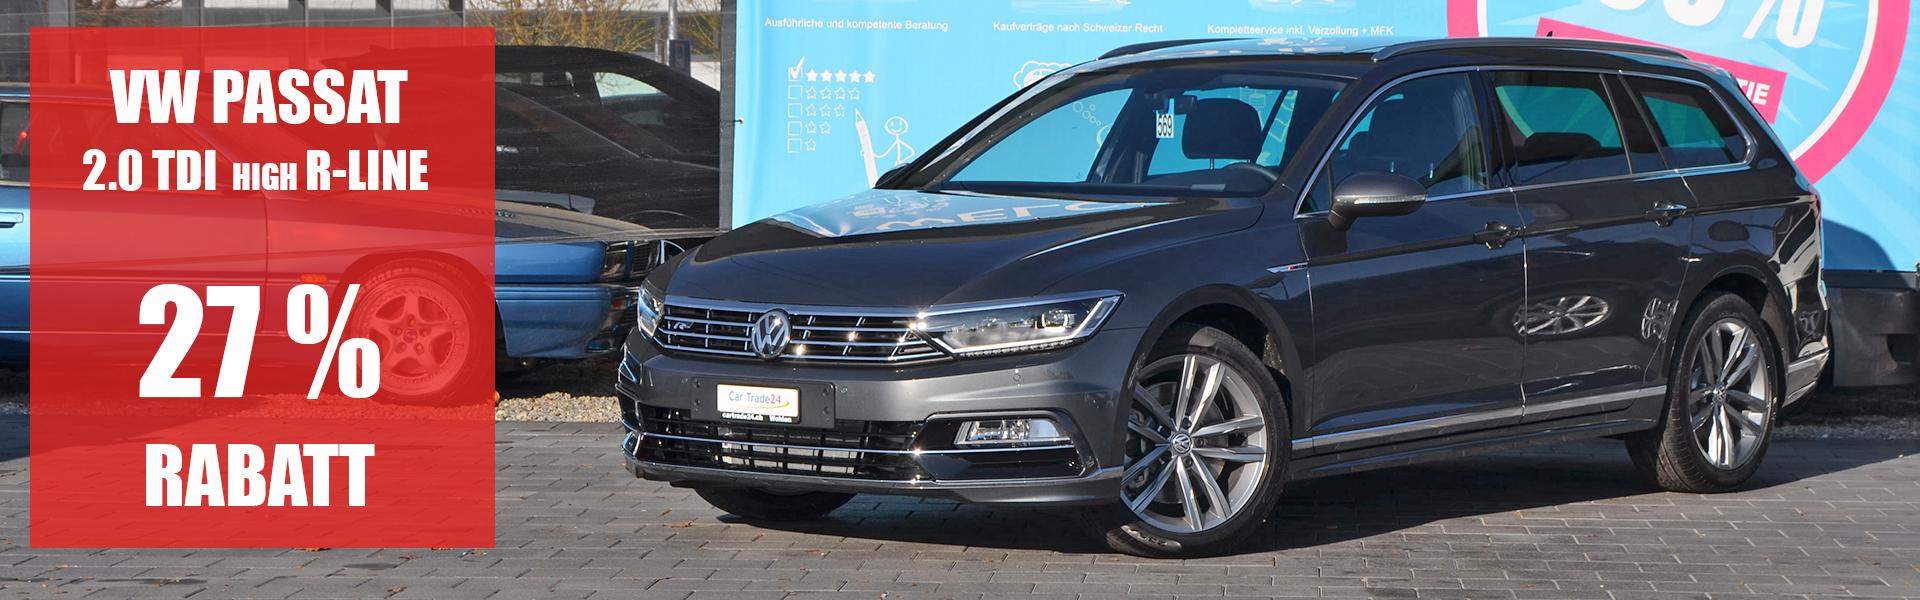 VW-Passat-grau